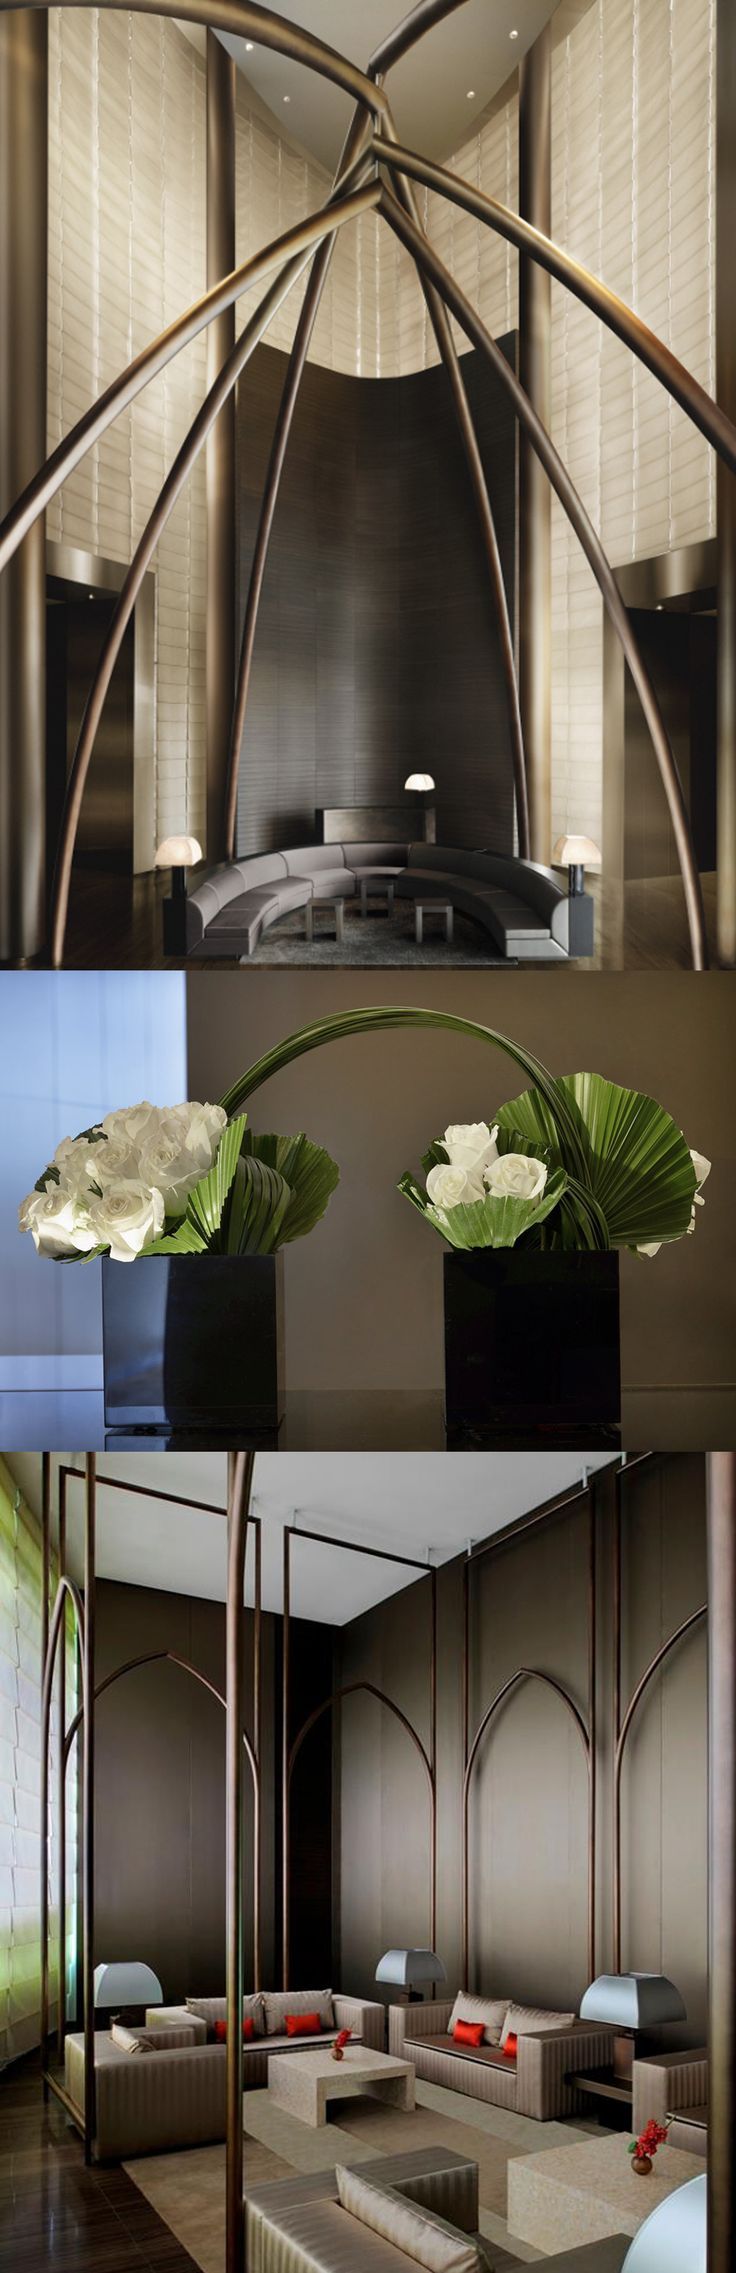 Best 25 Armani Hotel Ideas On Pinterest Hotel Bathrooms